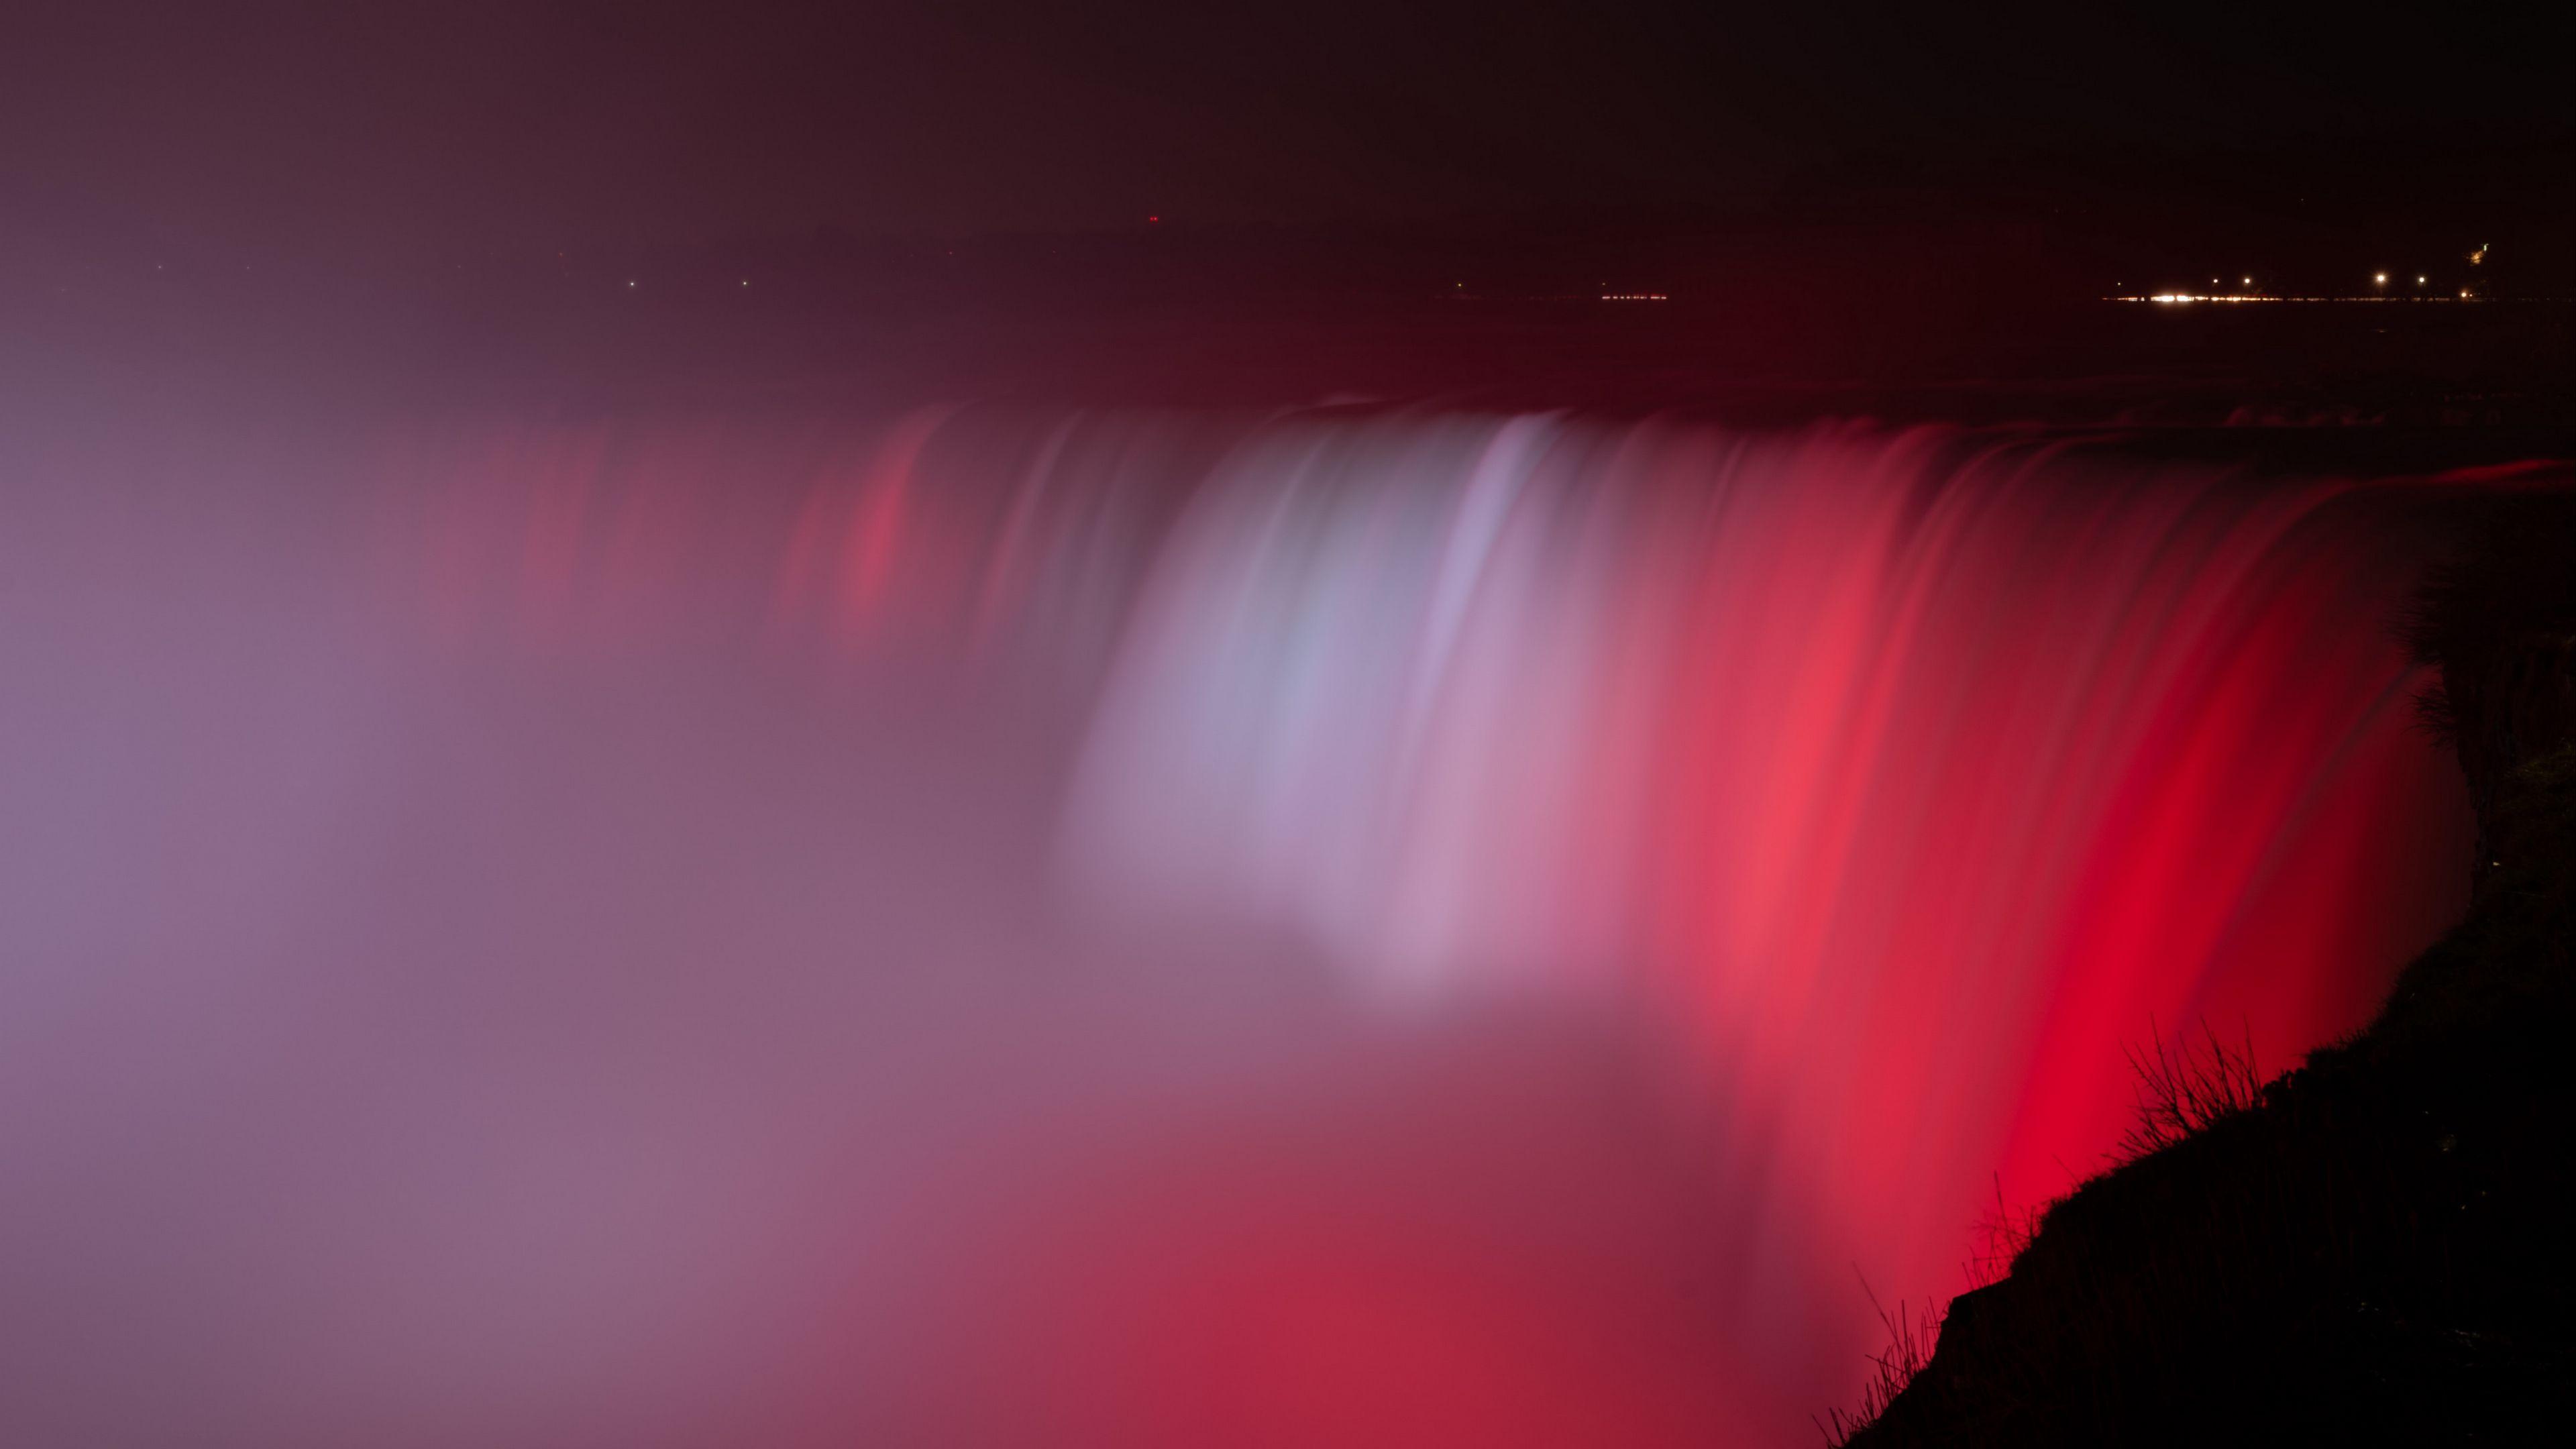 3840x2160 Wallpaper waterfall, fog, backlight, red, dark